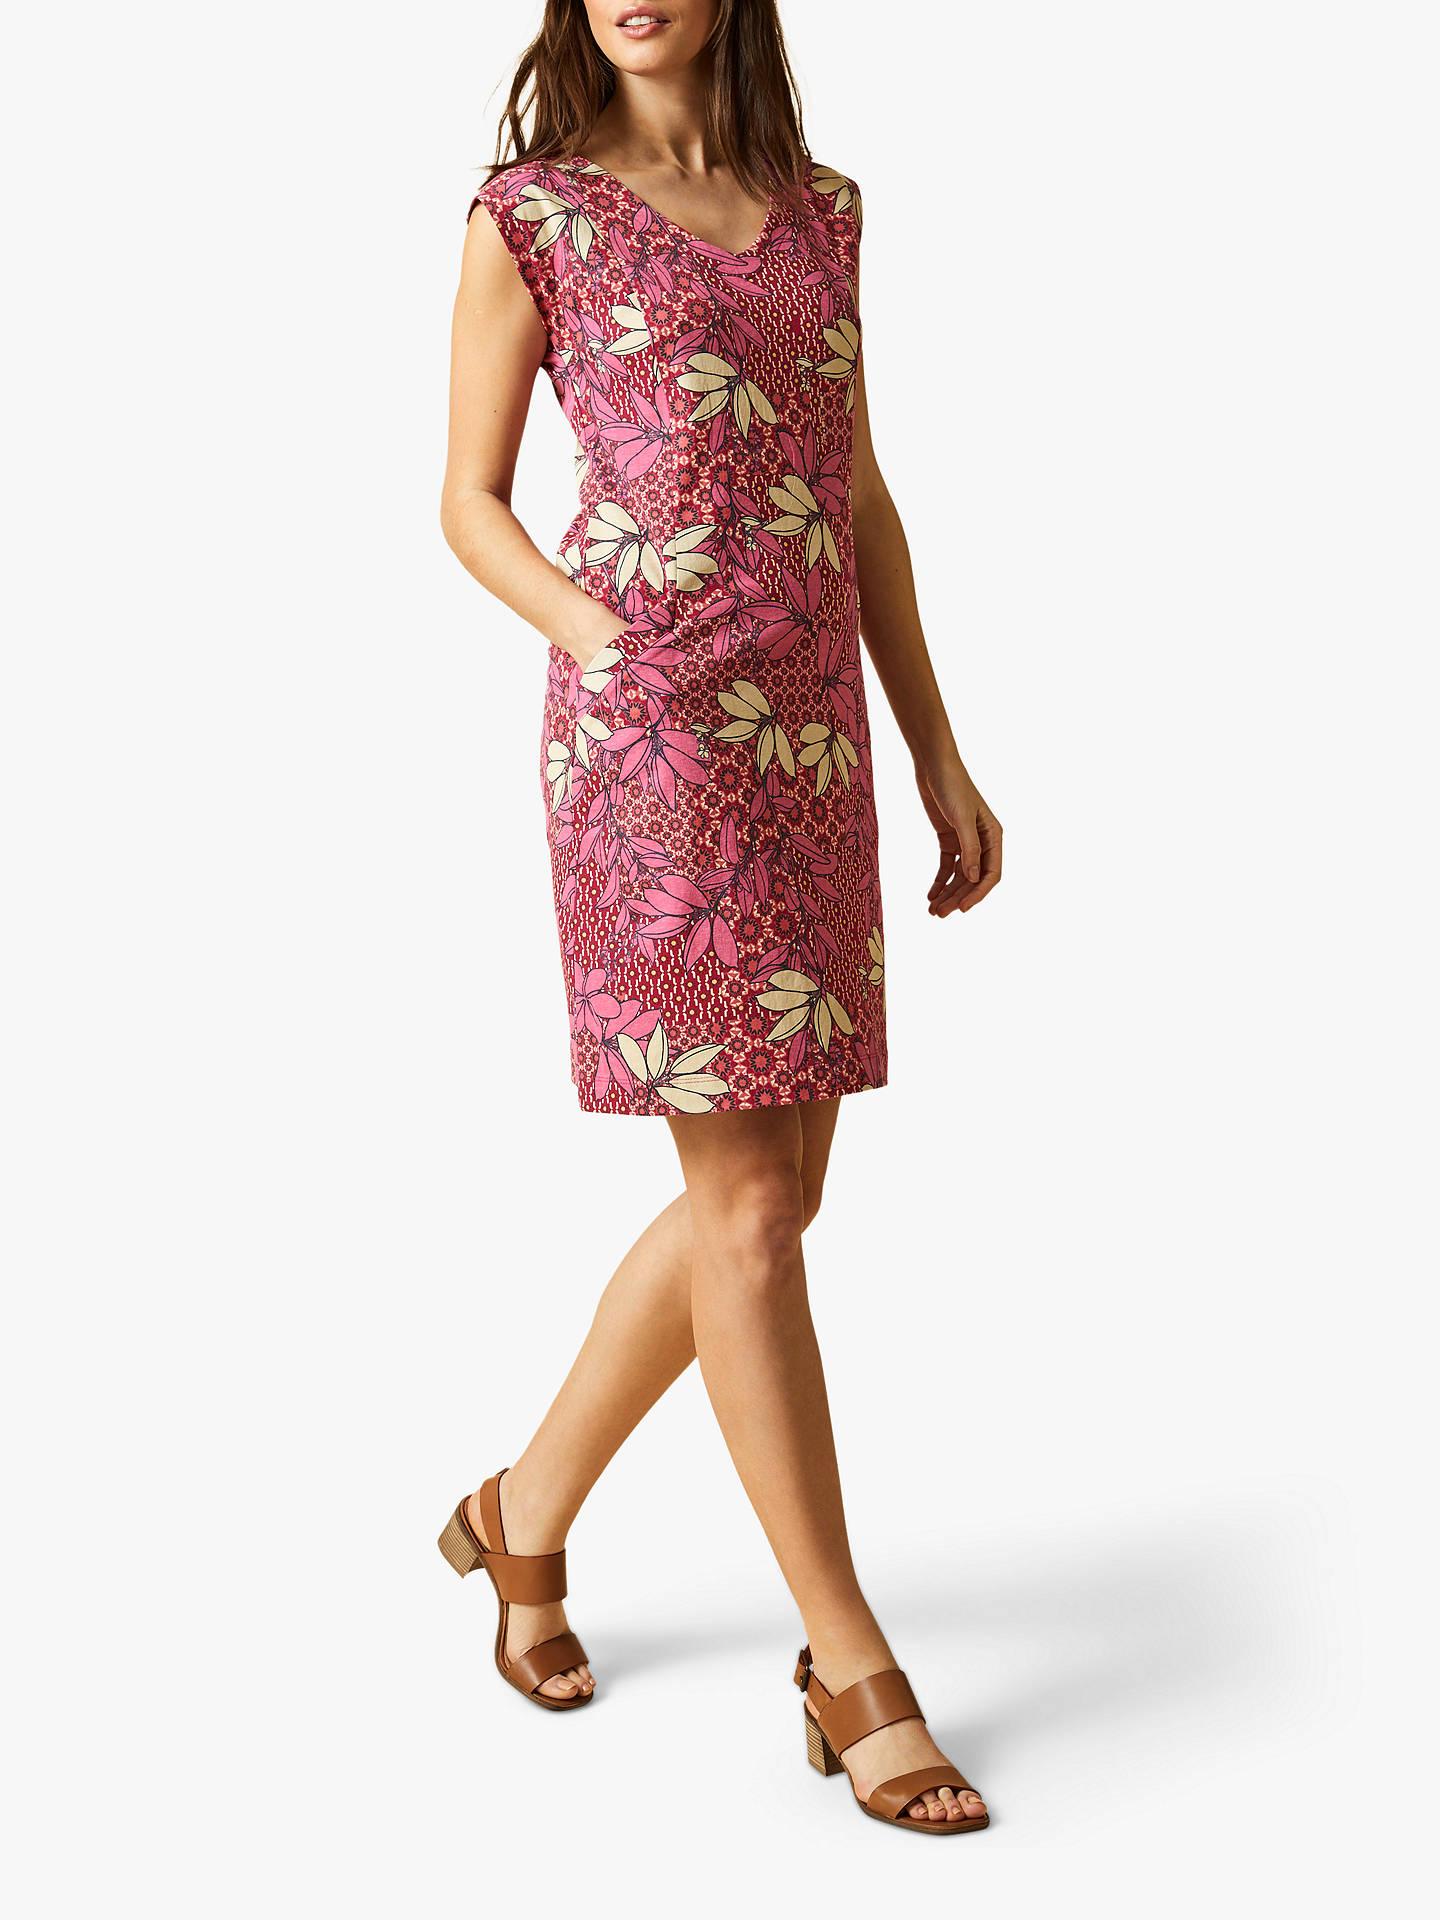 50afc6652c Buy White Stuff Fairtrade Lena Floral Dress, Pink, 8 Online at  johnlewis.com ...